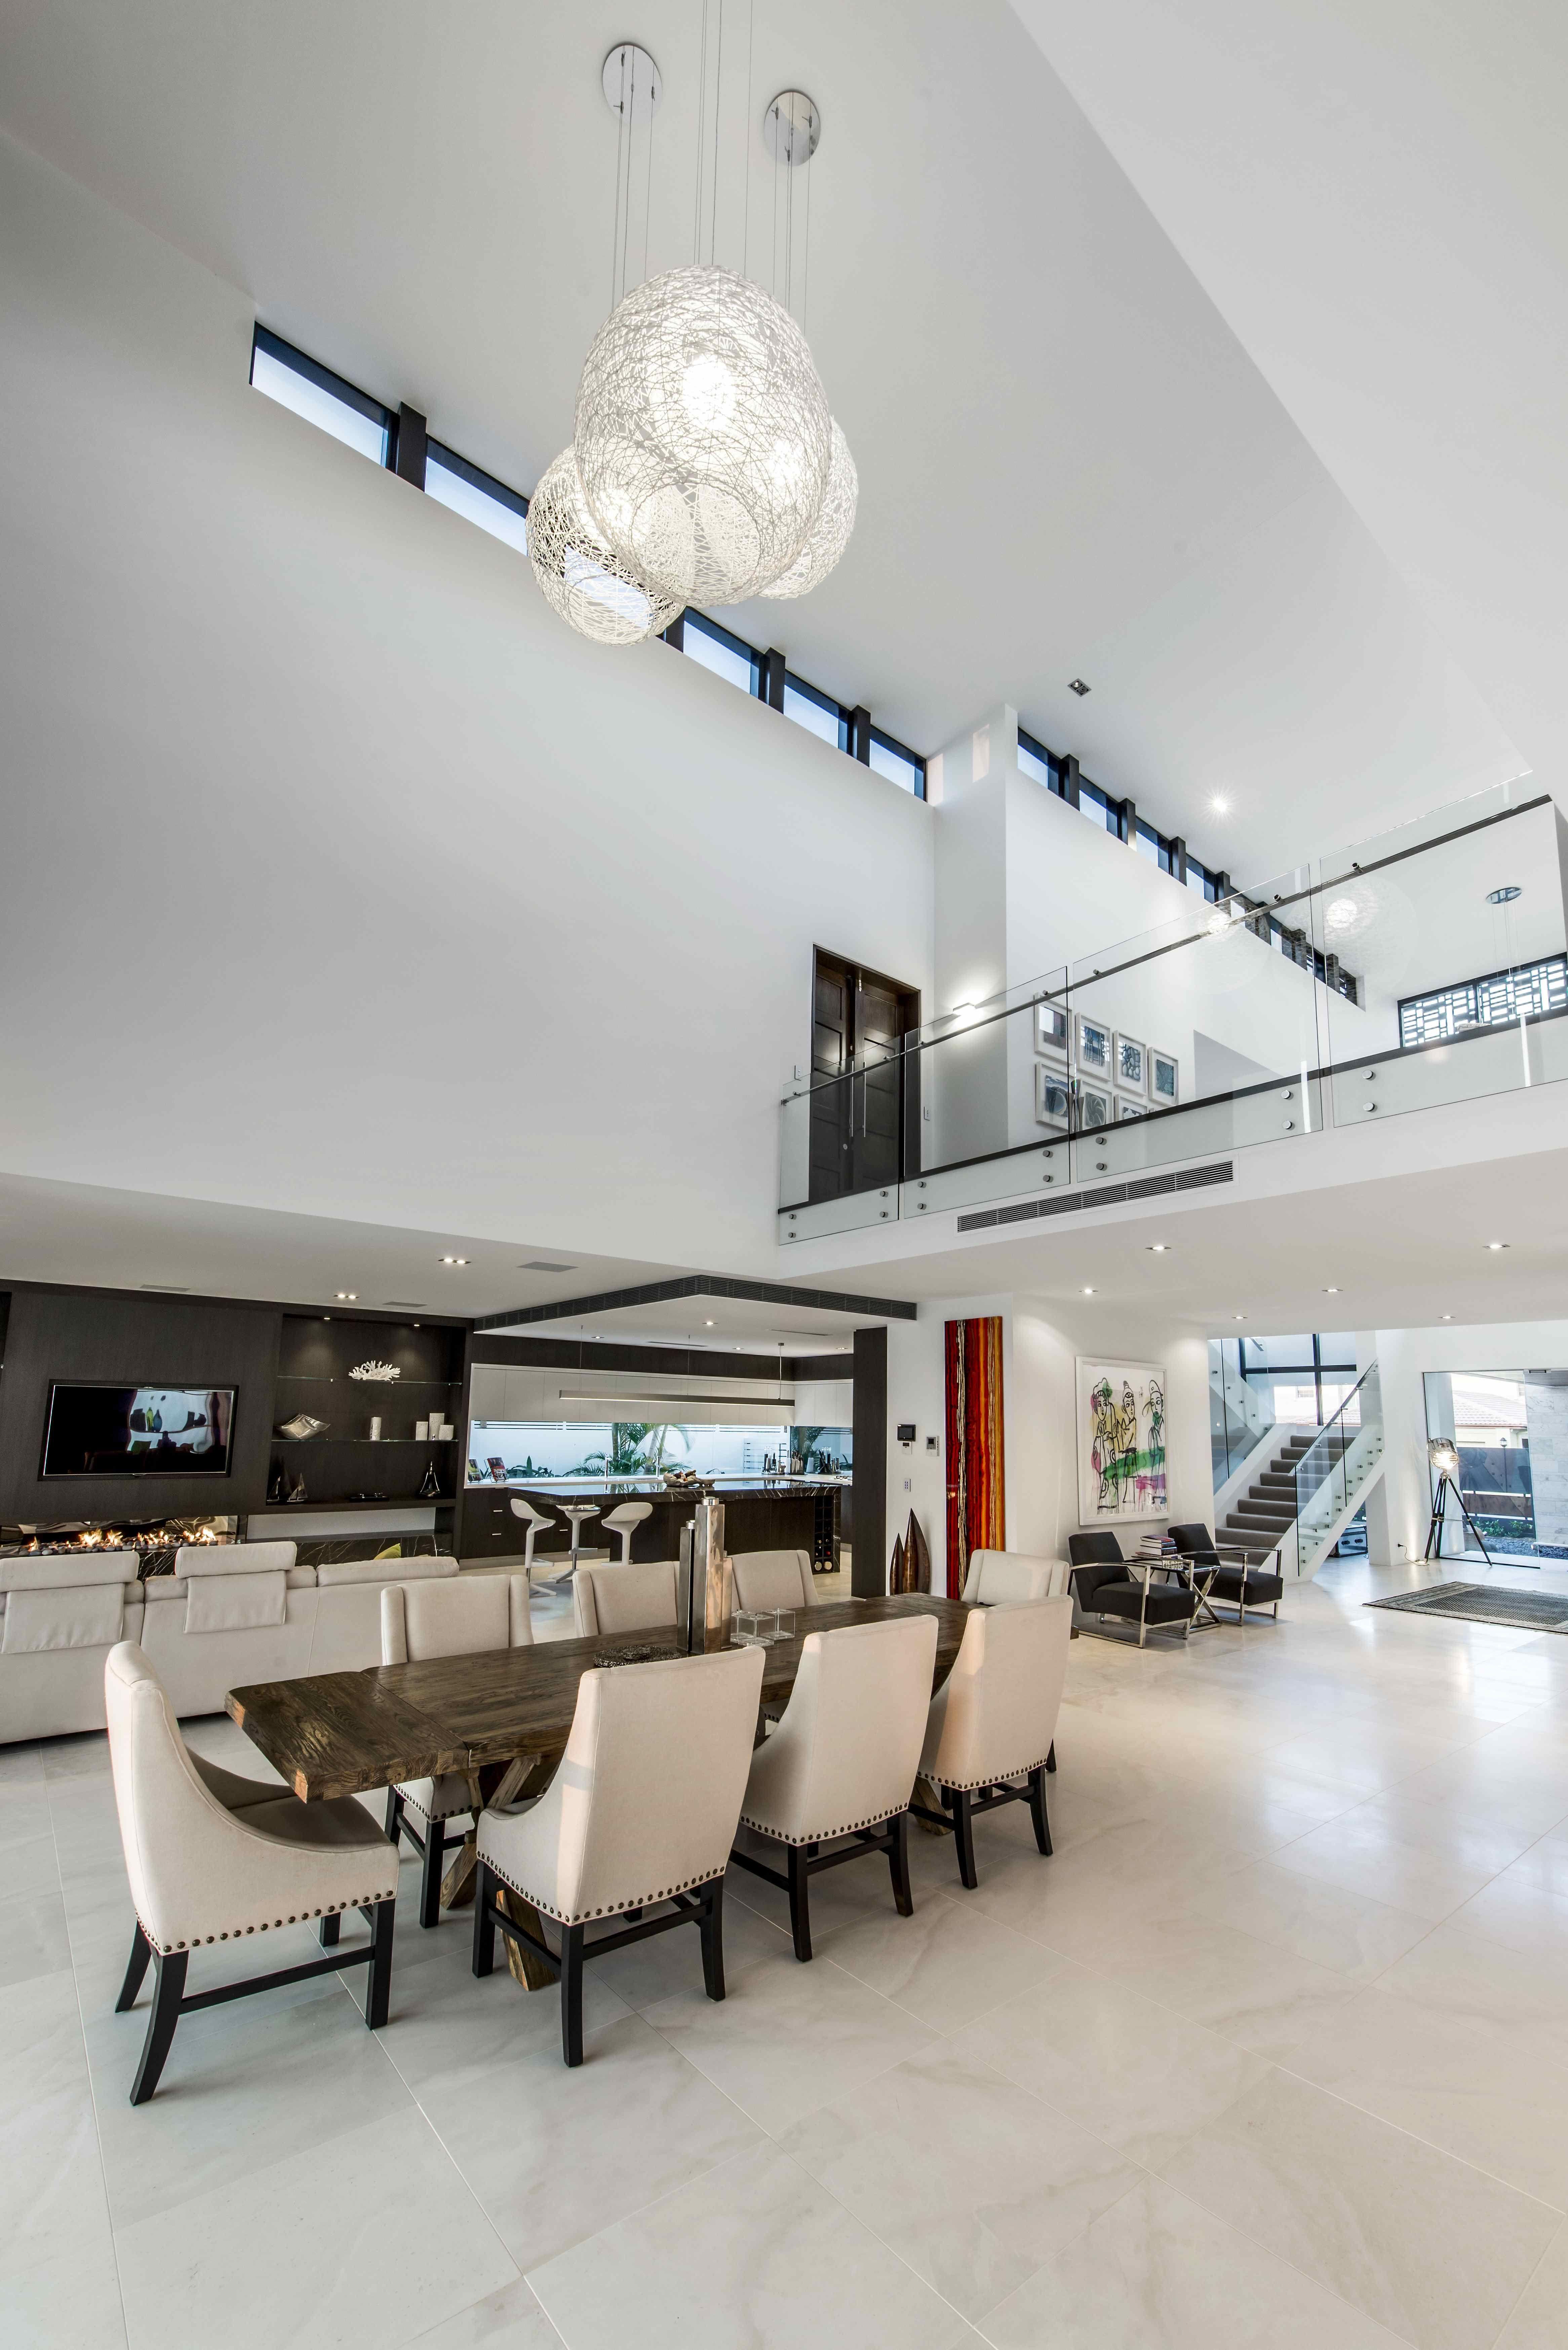 Decoraci n salones modernos modern interiors doble Comedores altos modernos